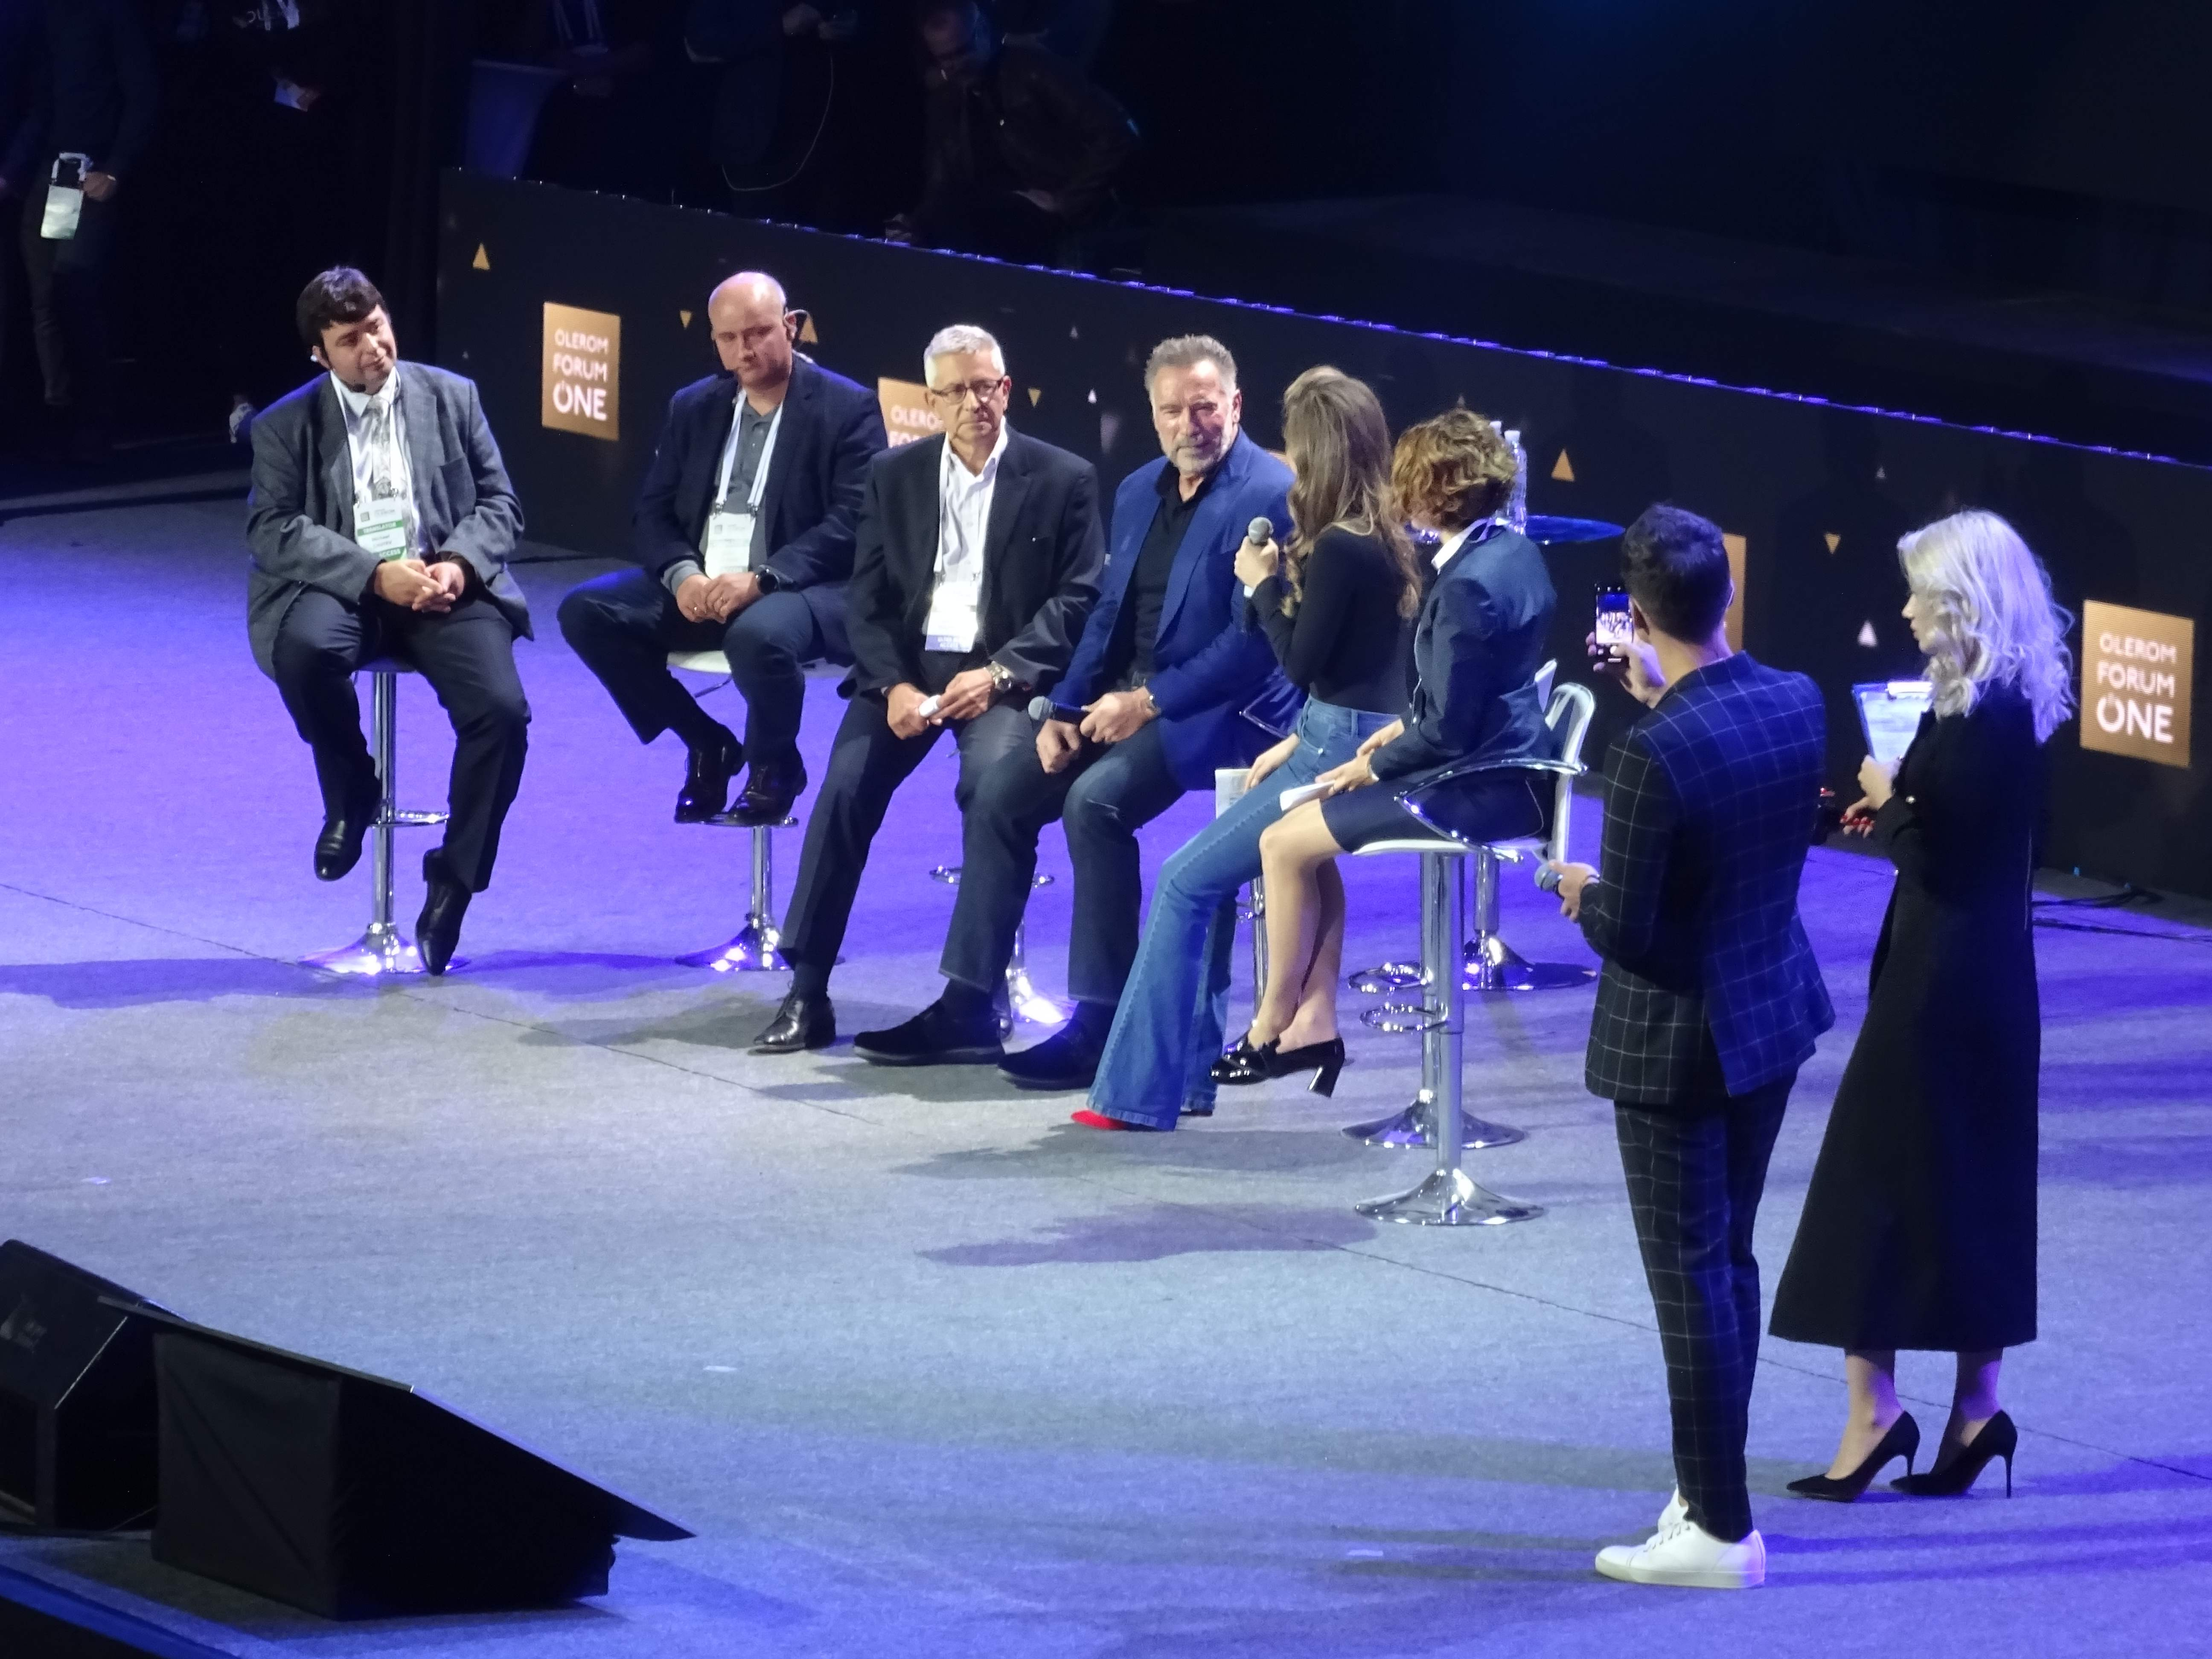 Olerom-Forum-2018-Kyiv-Ukraine-18-03-Arnold-Schwarzenegger-Gennady-Polonsky-Fashion-Models-DSC09520.jpg